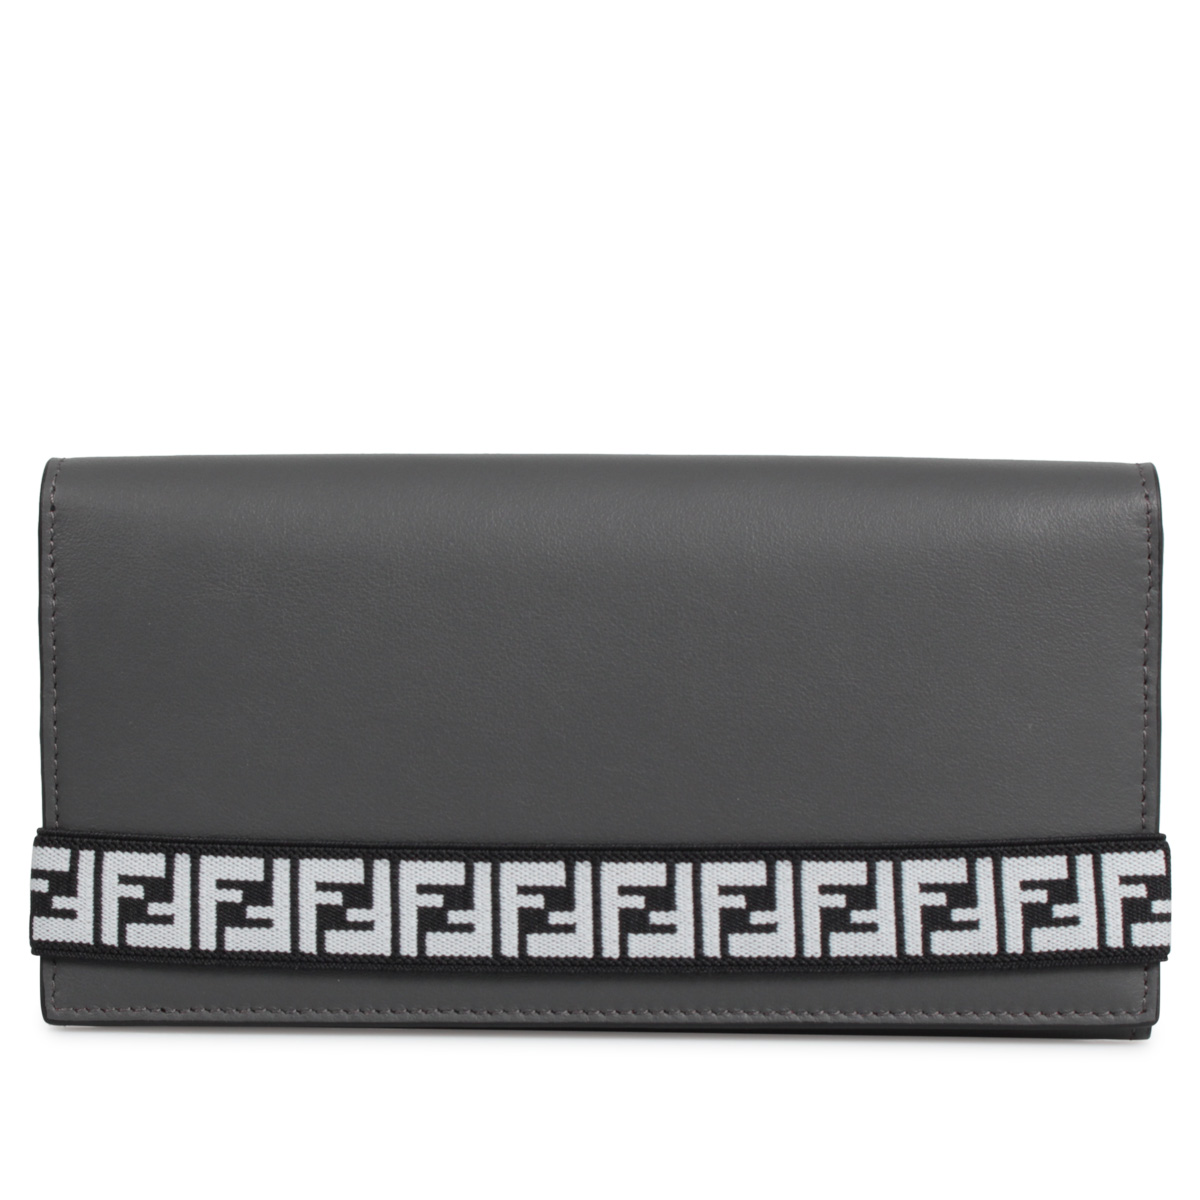 FENDI BRANDED CONTINENTAL WALLET フェンディ 財布 長財布 メンズ レディース グレー 7M0268 A8VC